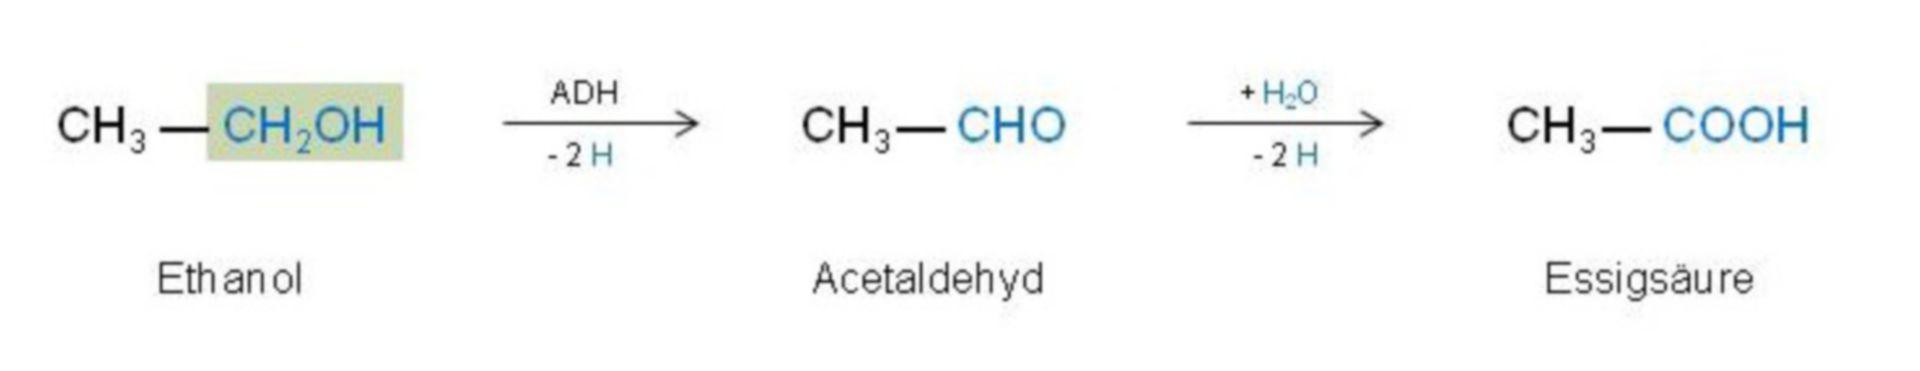 The degradation of ethanol